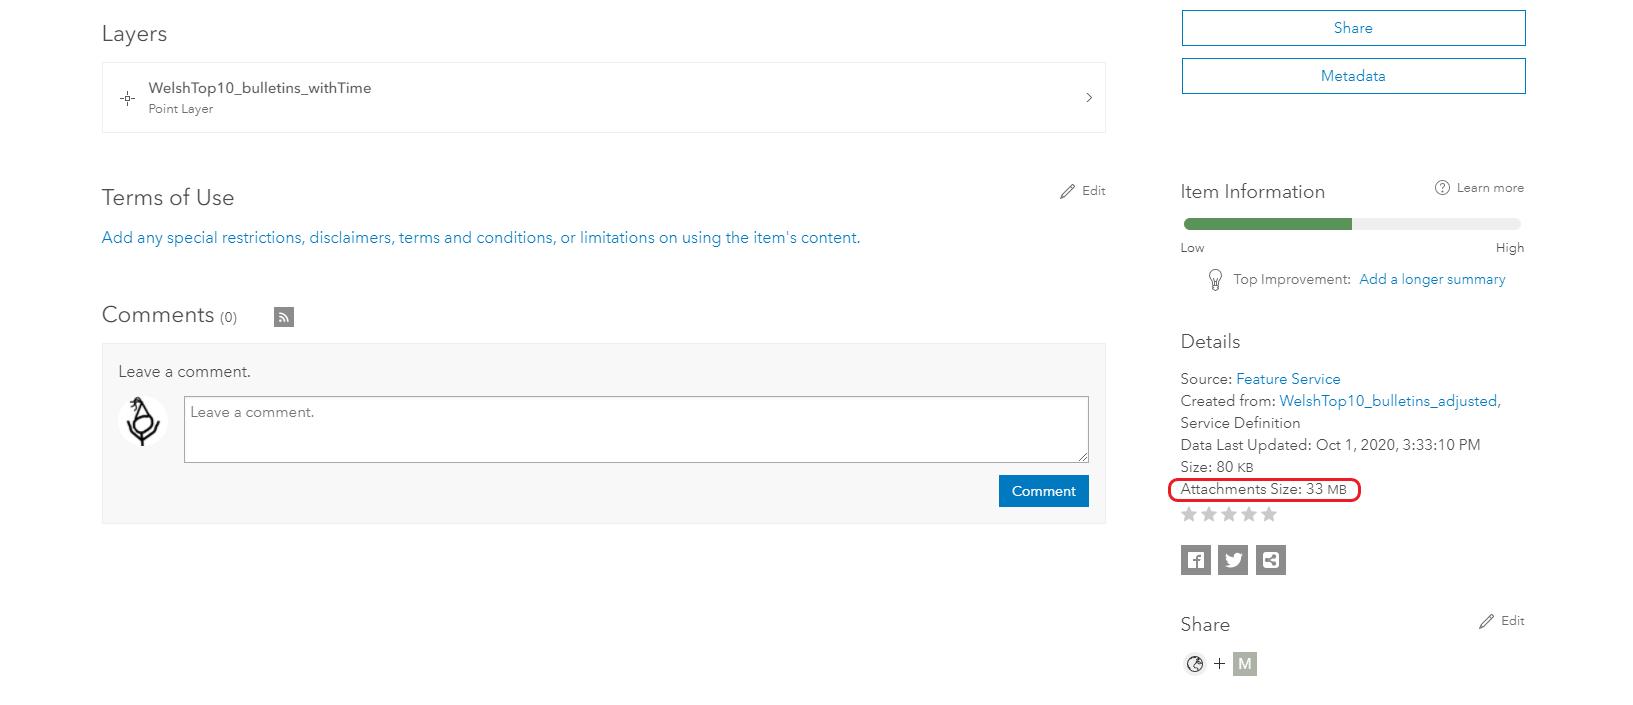 ArcGIS Online item view showing attachment storage